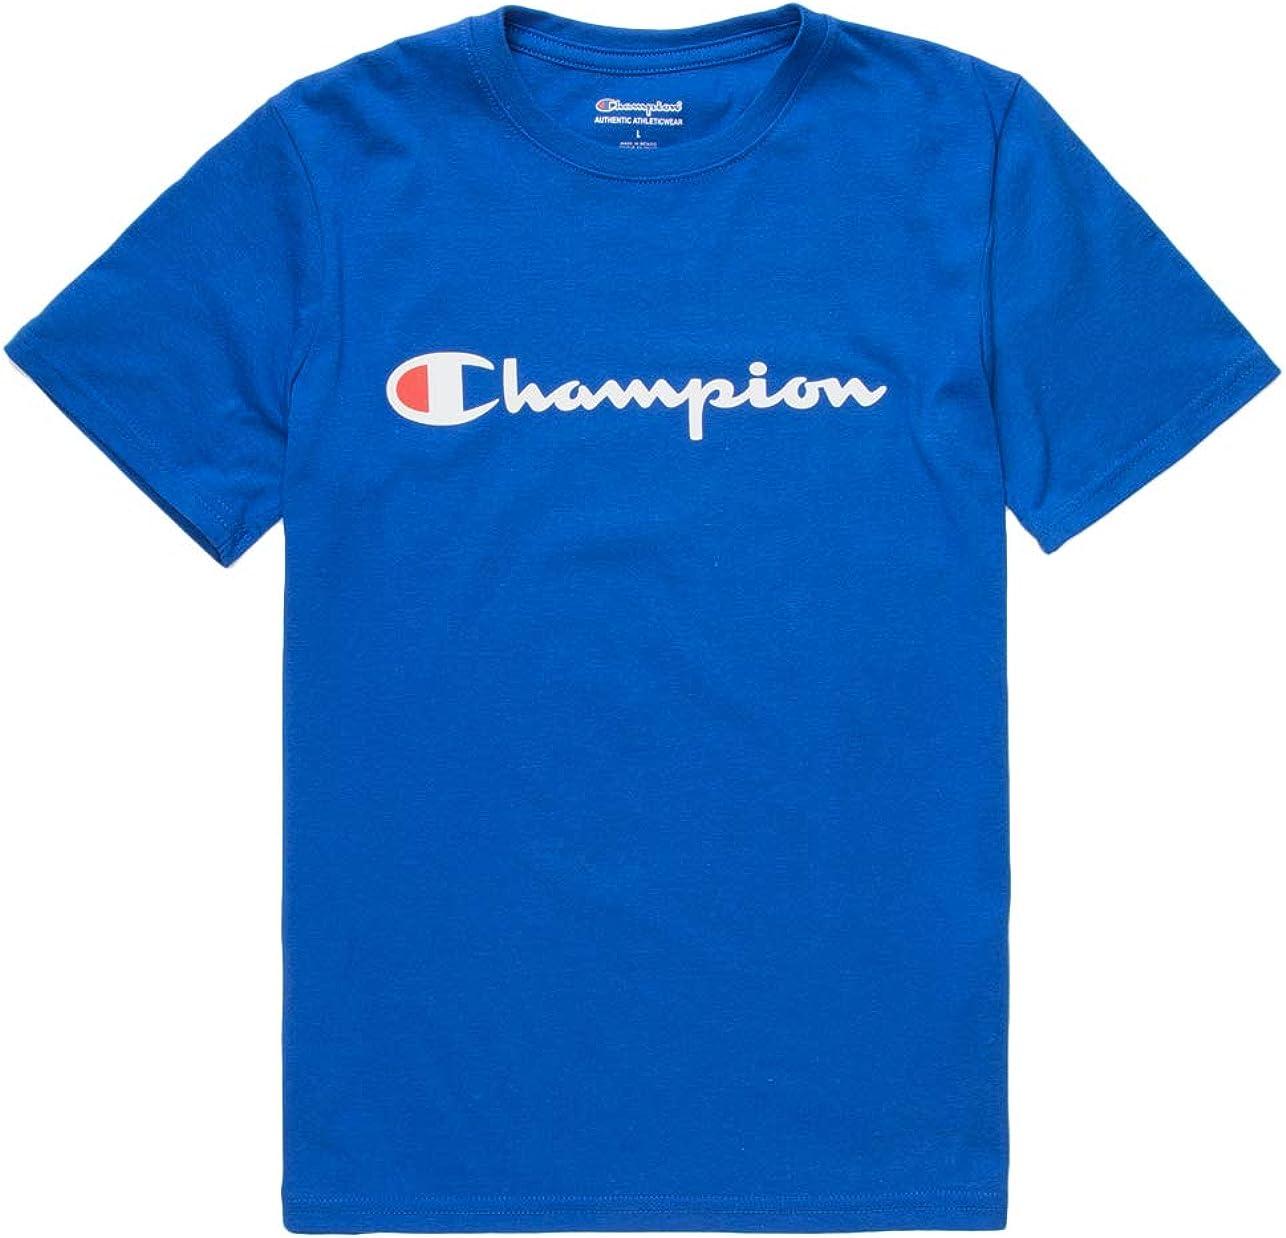 Champion Boys Short Sleeve Logo Tee Shirt